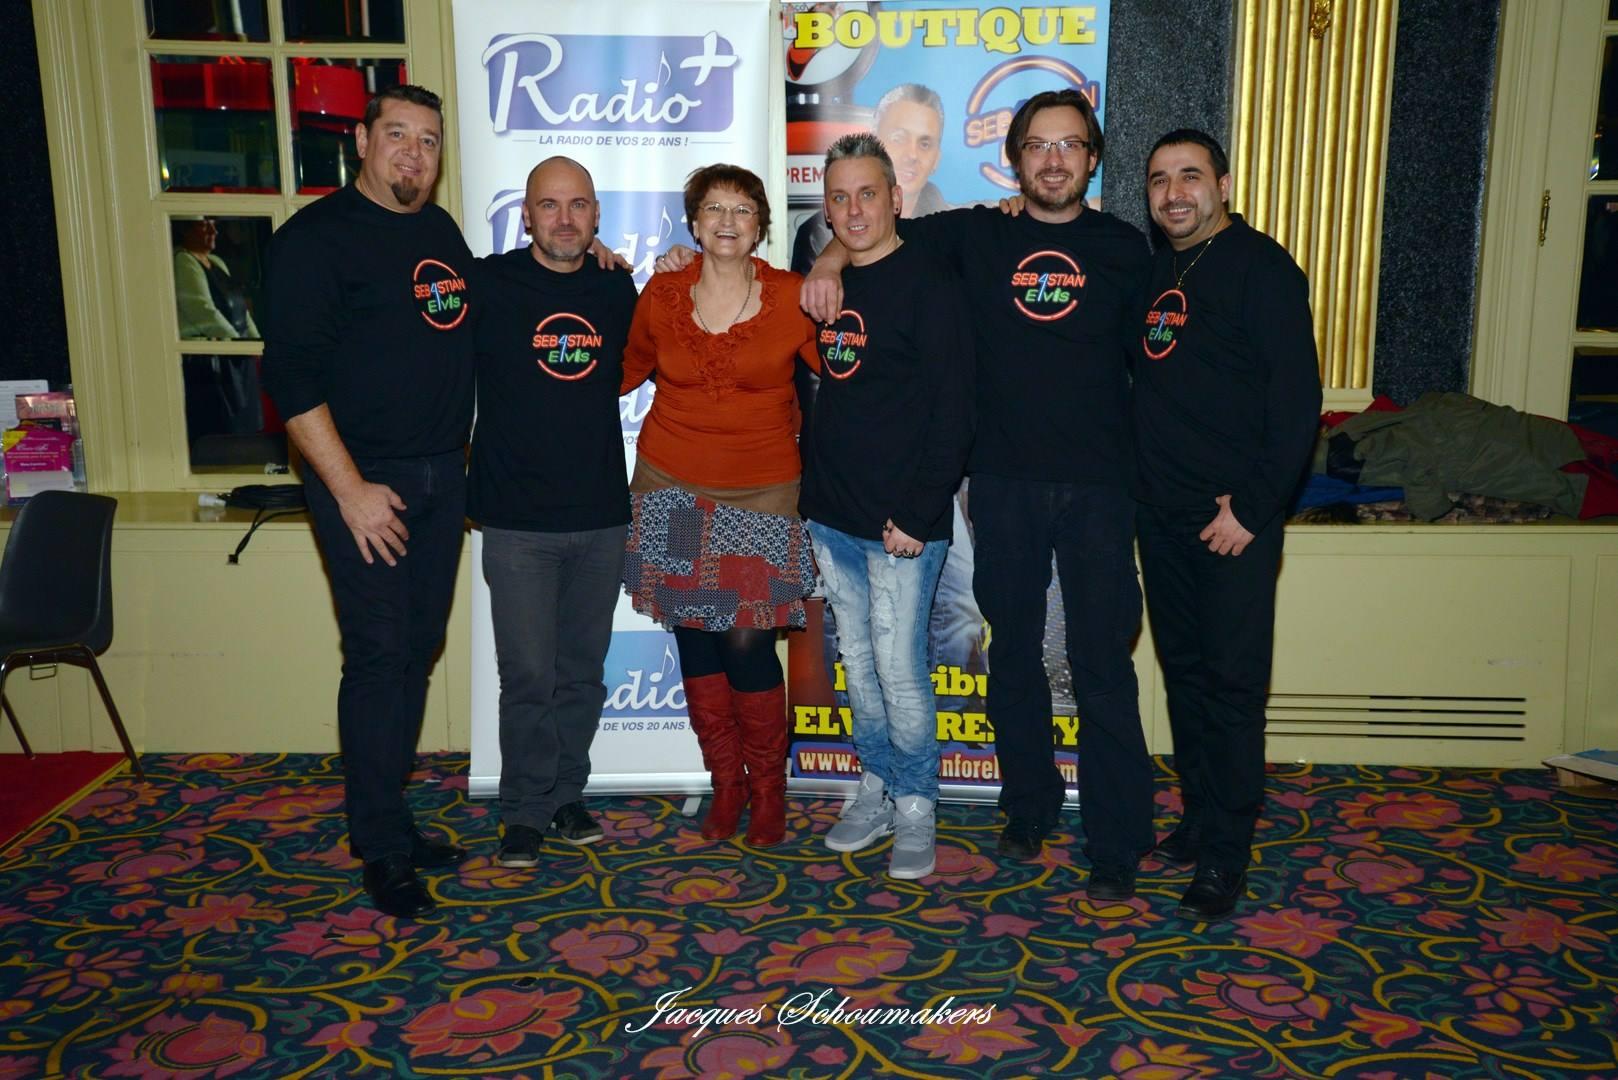 sebastian-for-elvis-casino-de-spa-happy-birthday-elvis-facebook-68b